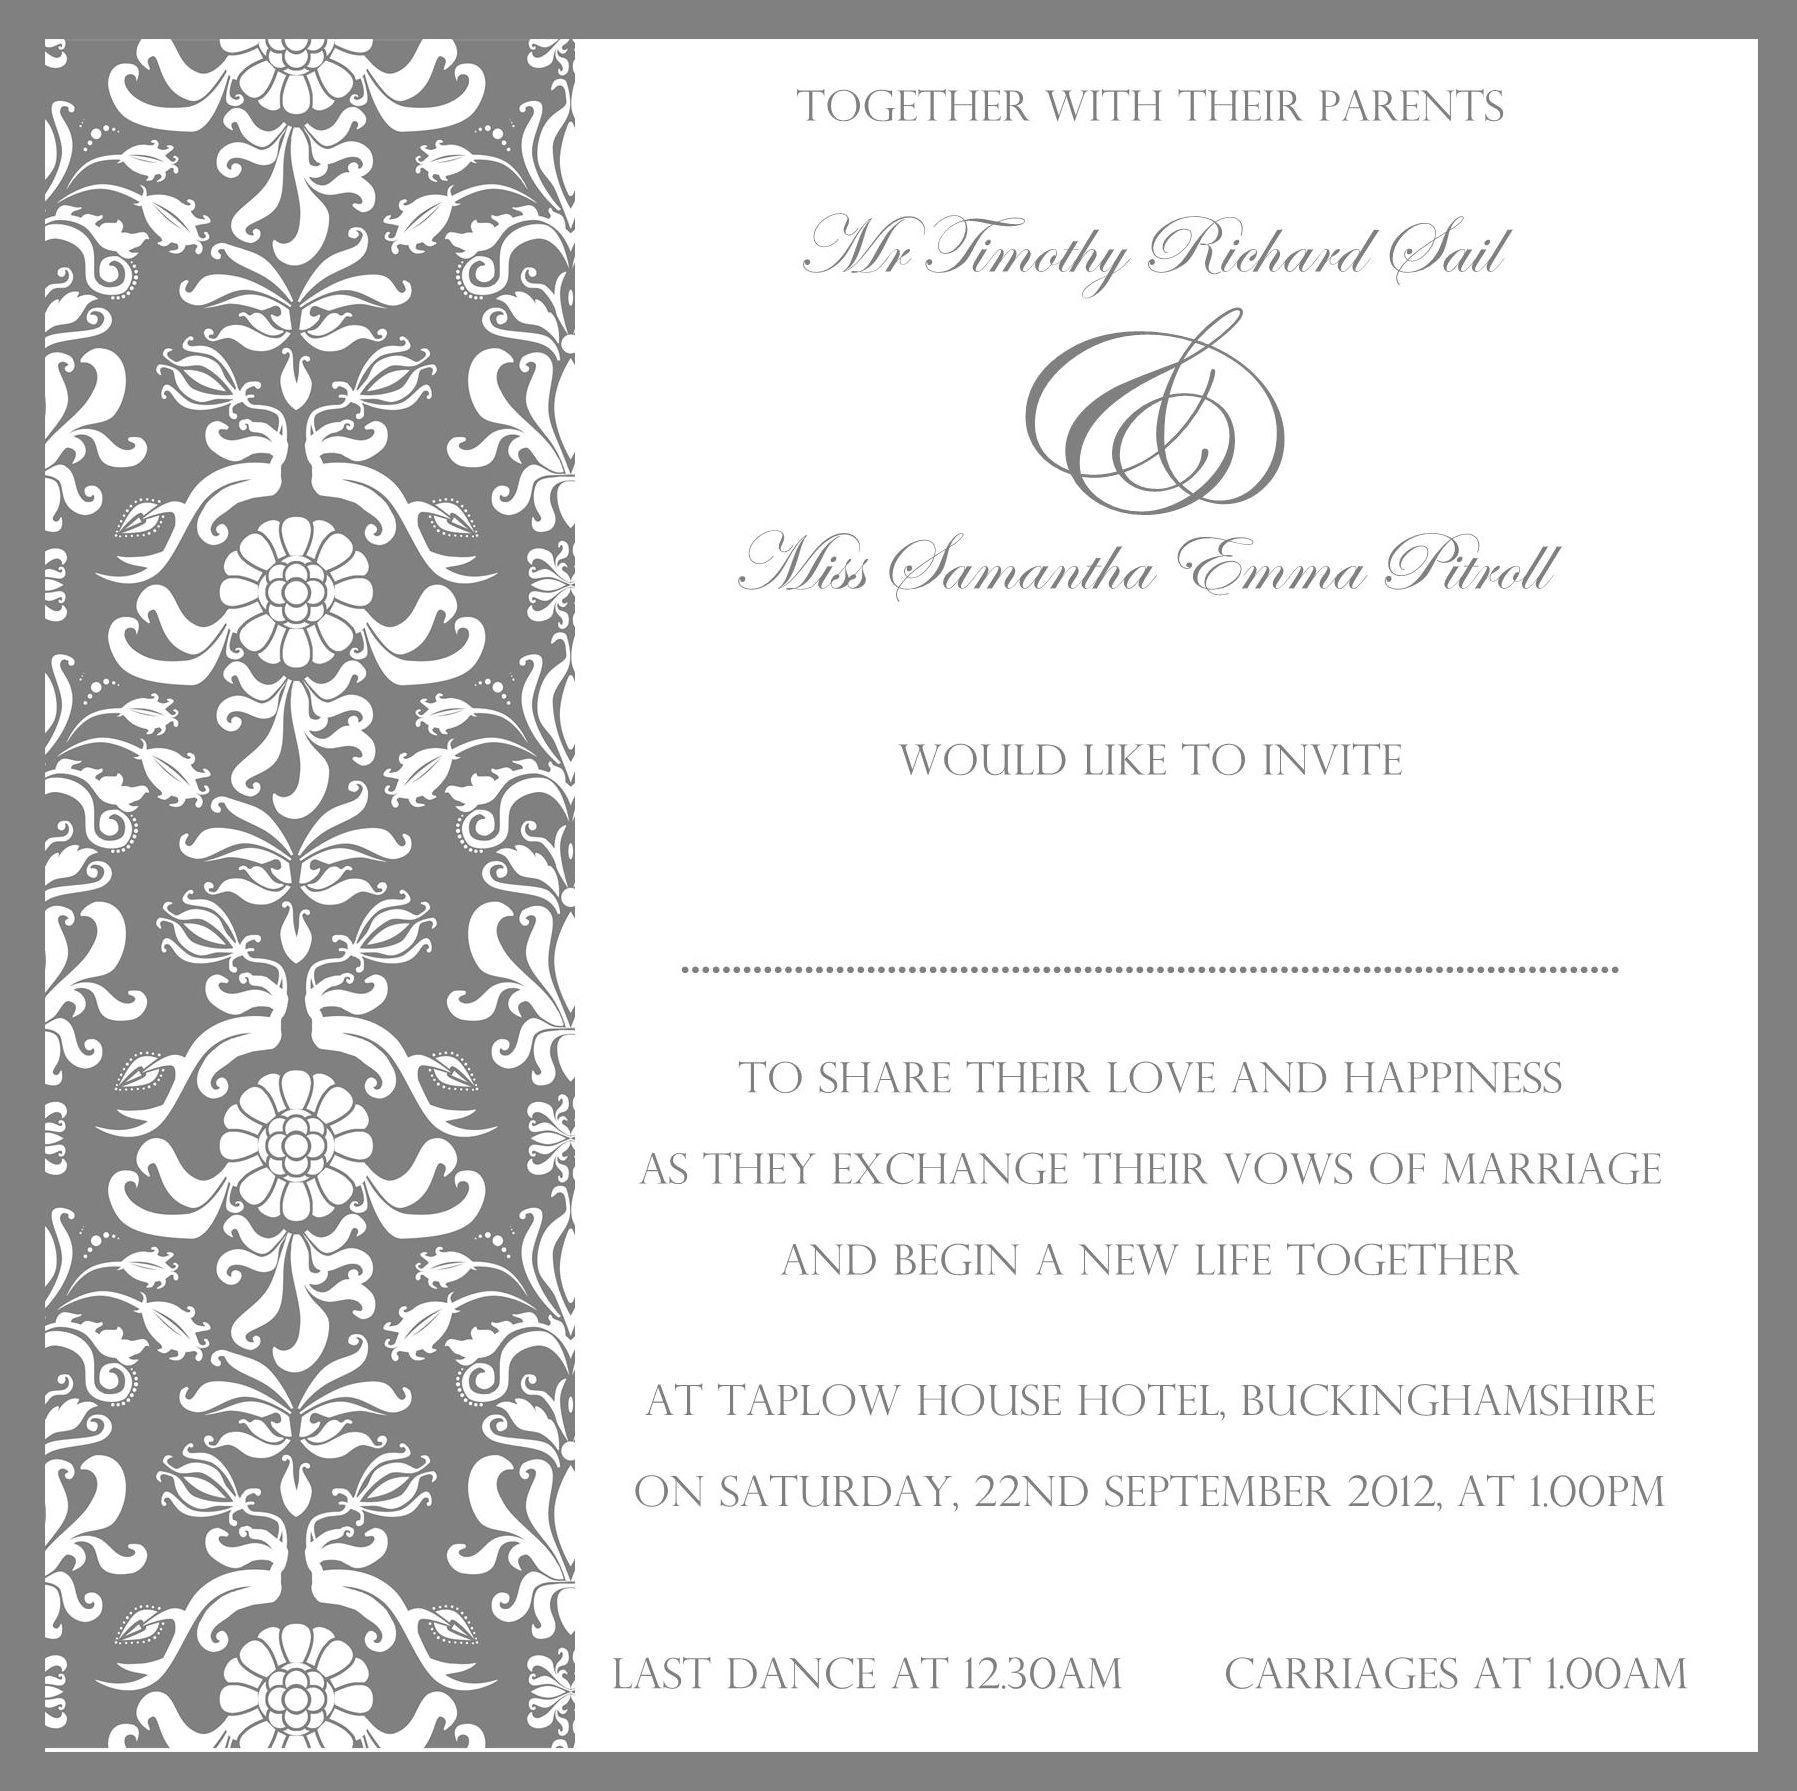 Beautiful invitation from www.sew-unique.co.uk